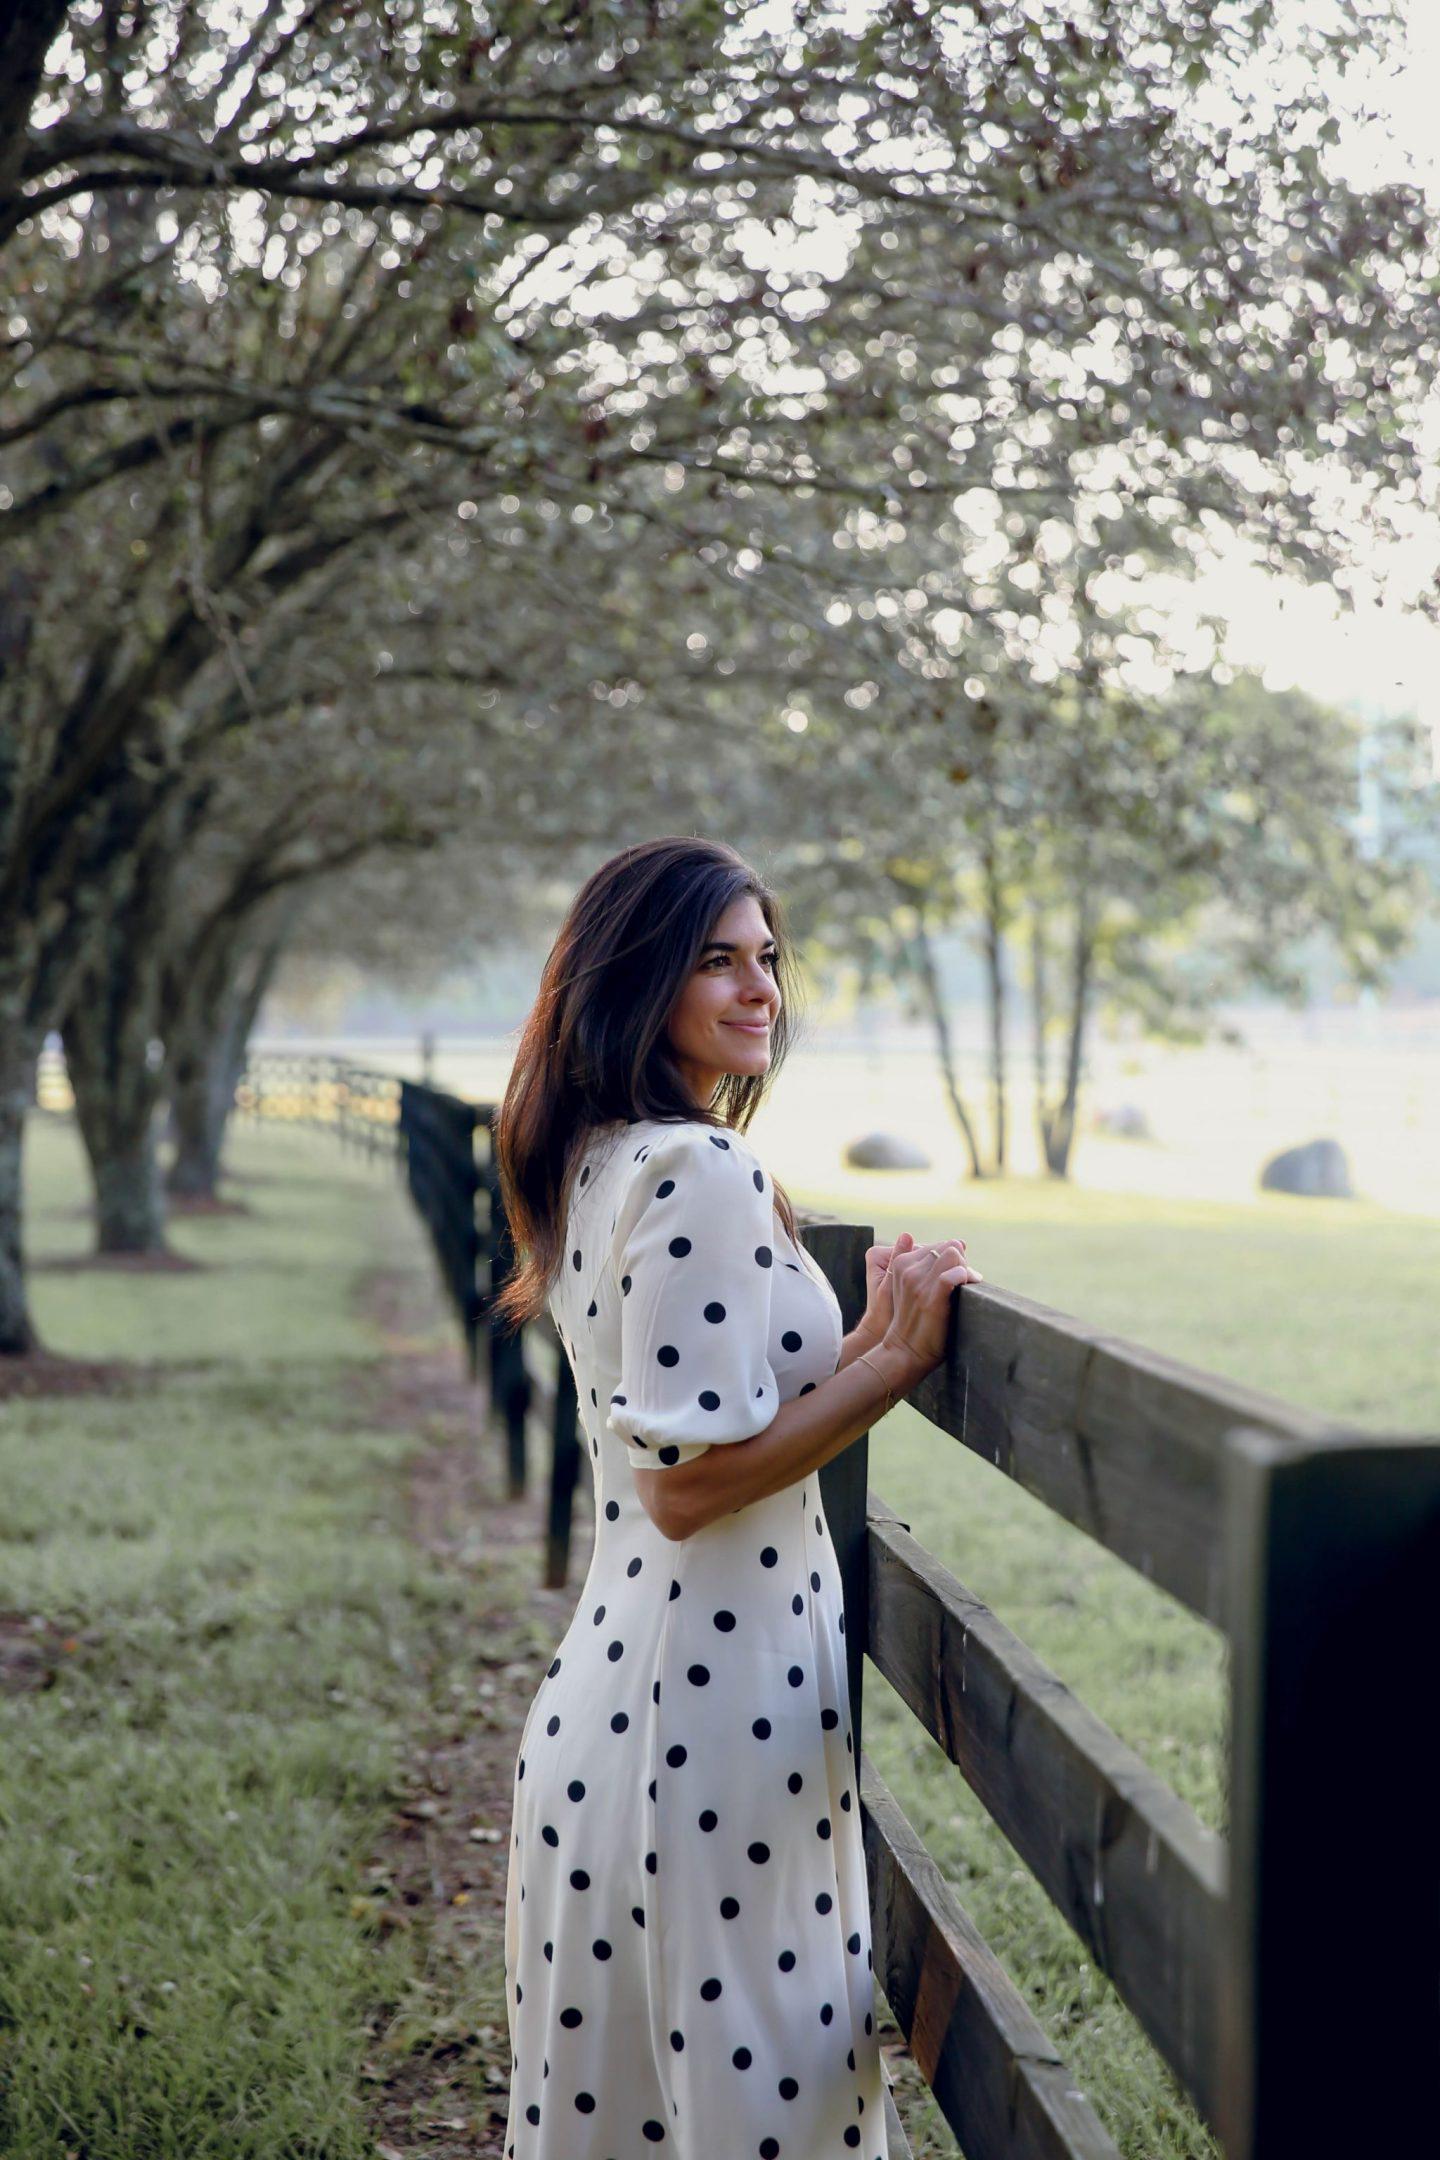 countryside - polka dot dress  - Lauren Schwaiger